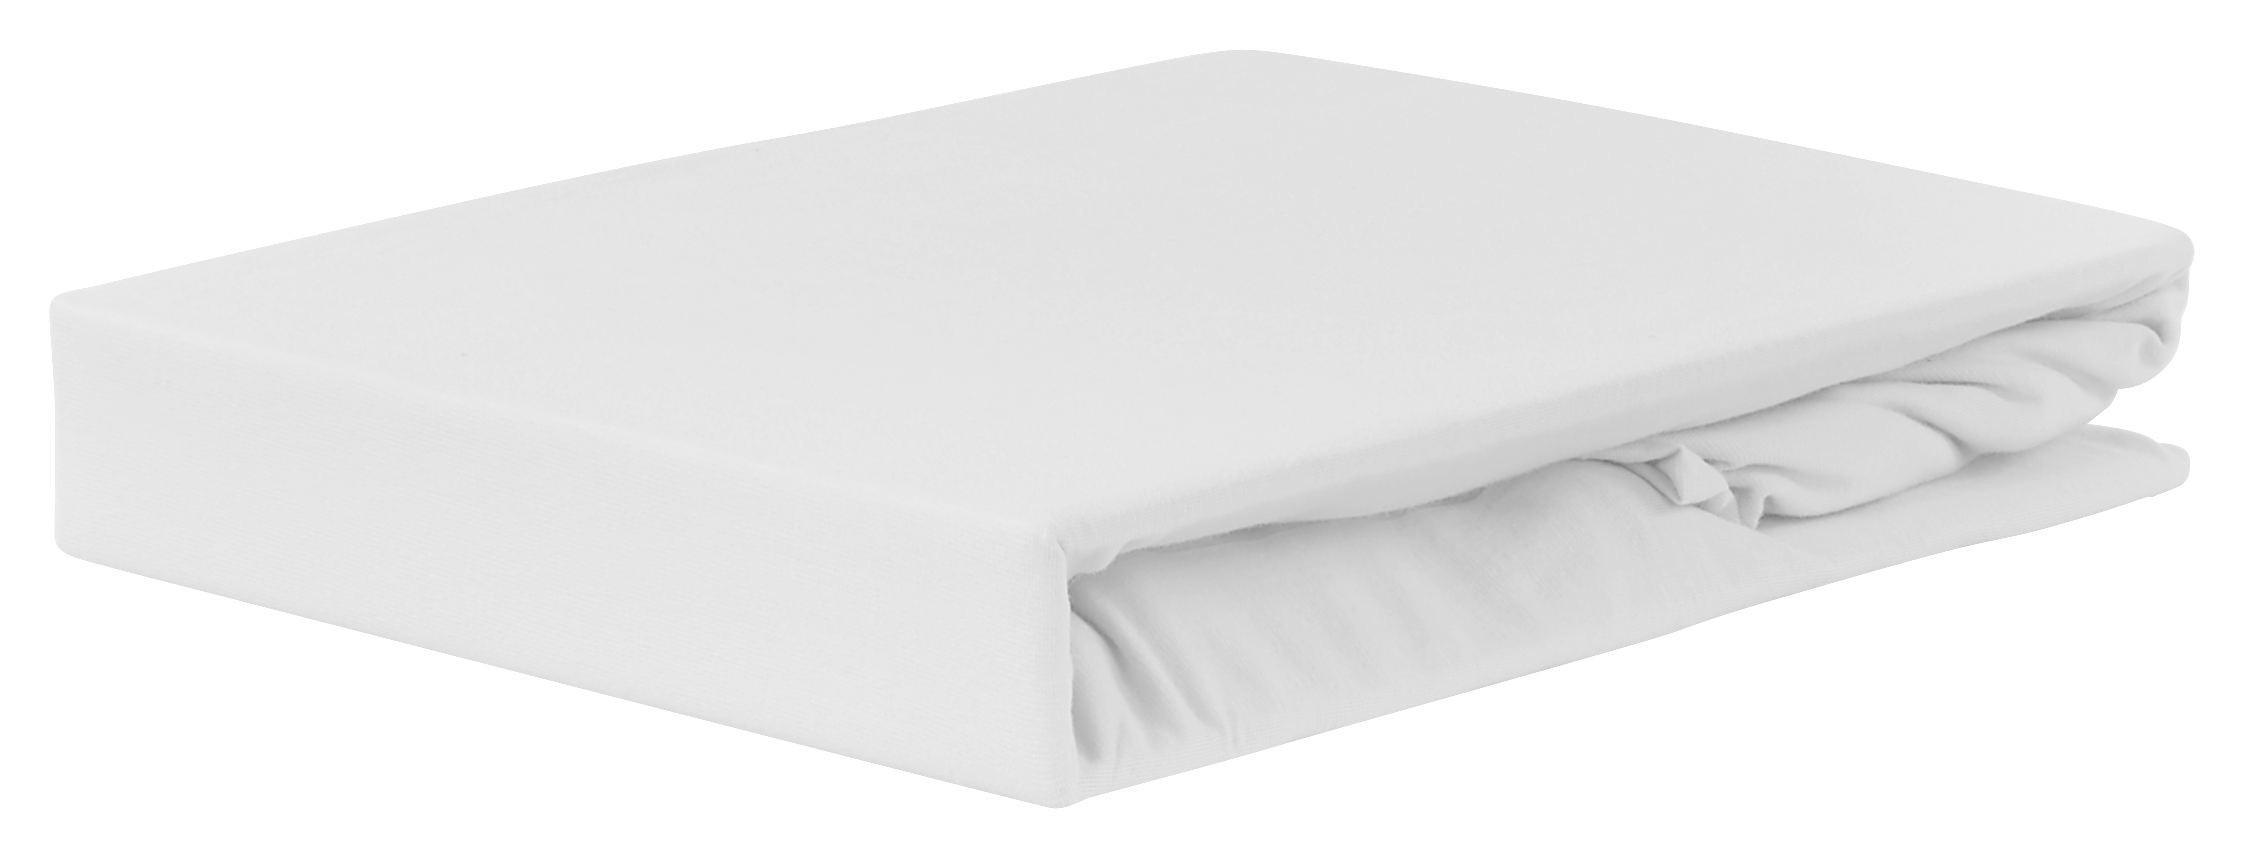 Gumis Lepedő Jardena Fehér - fehér, konvencionális, textil (100/200cm) - OMBRA